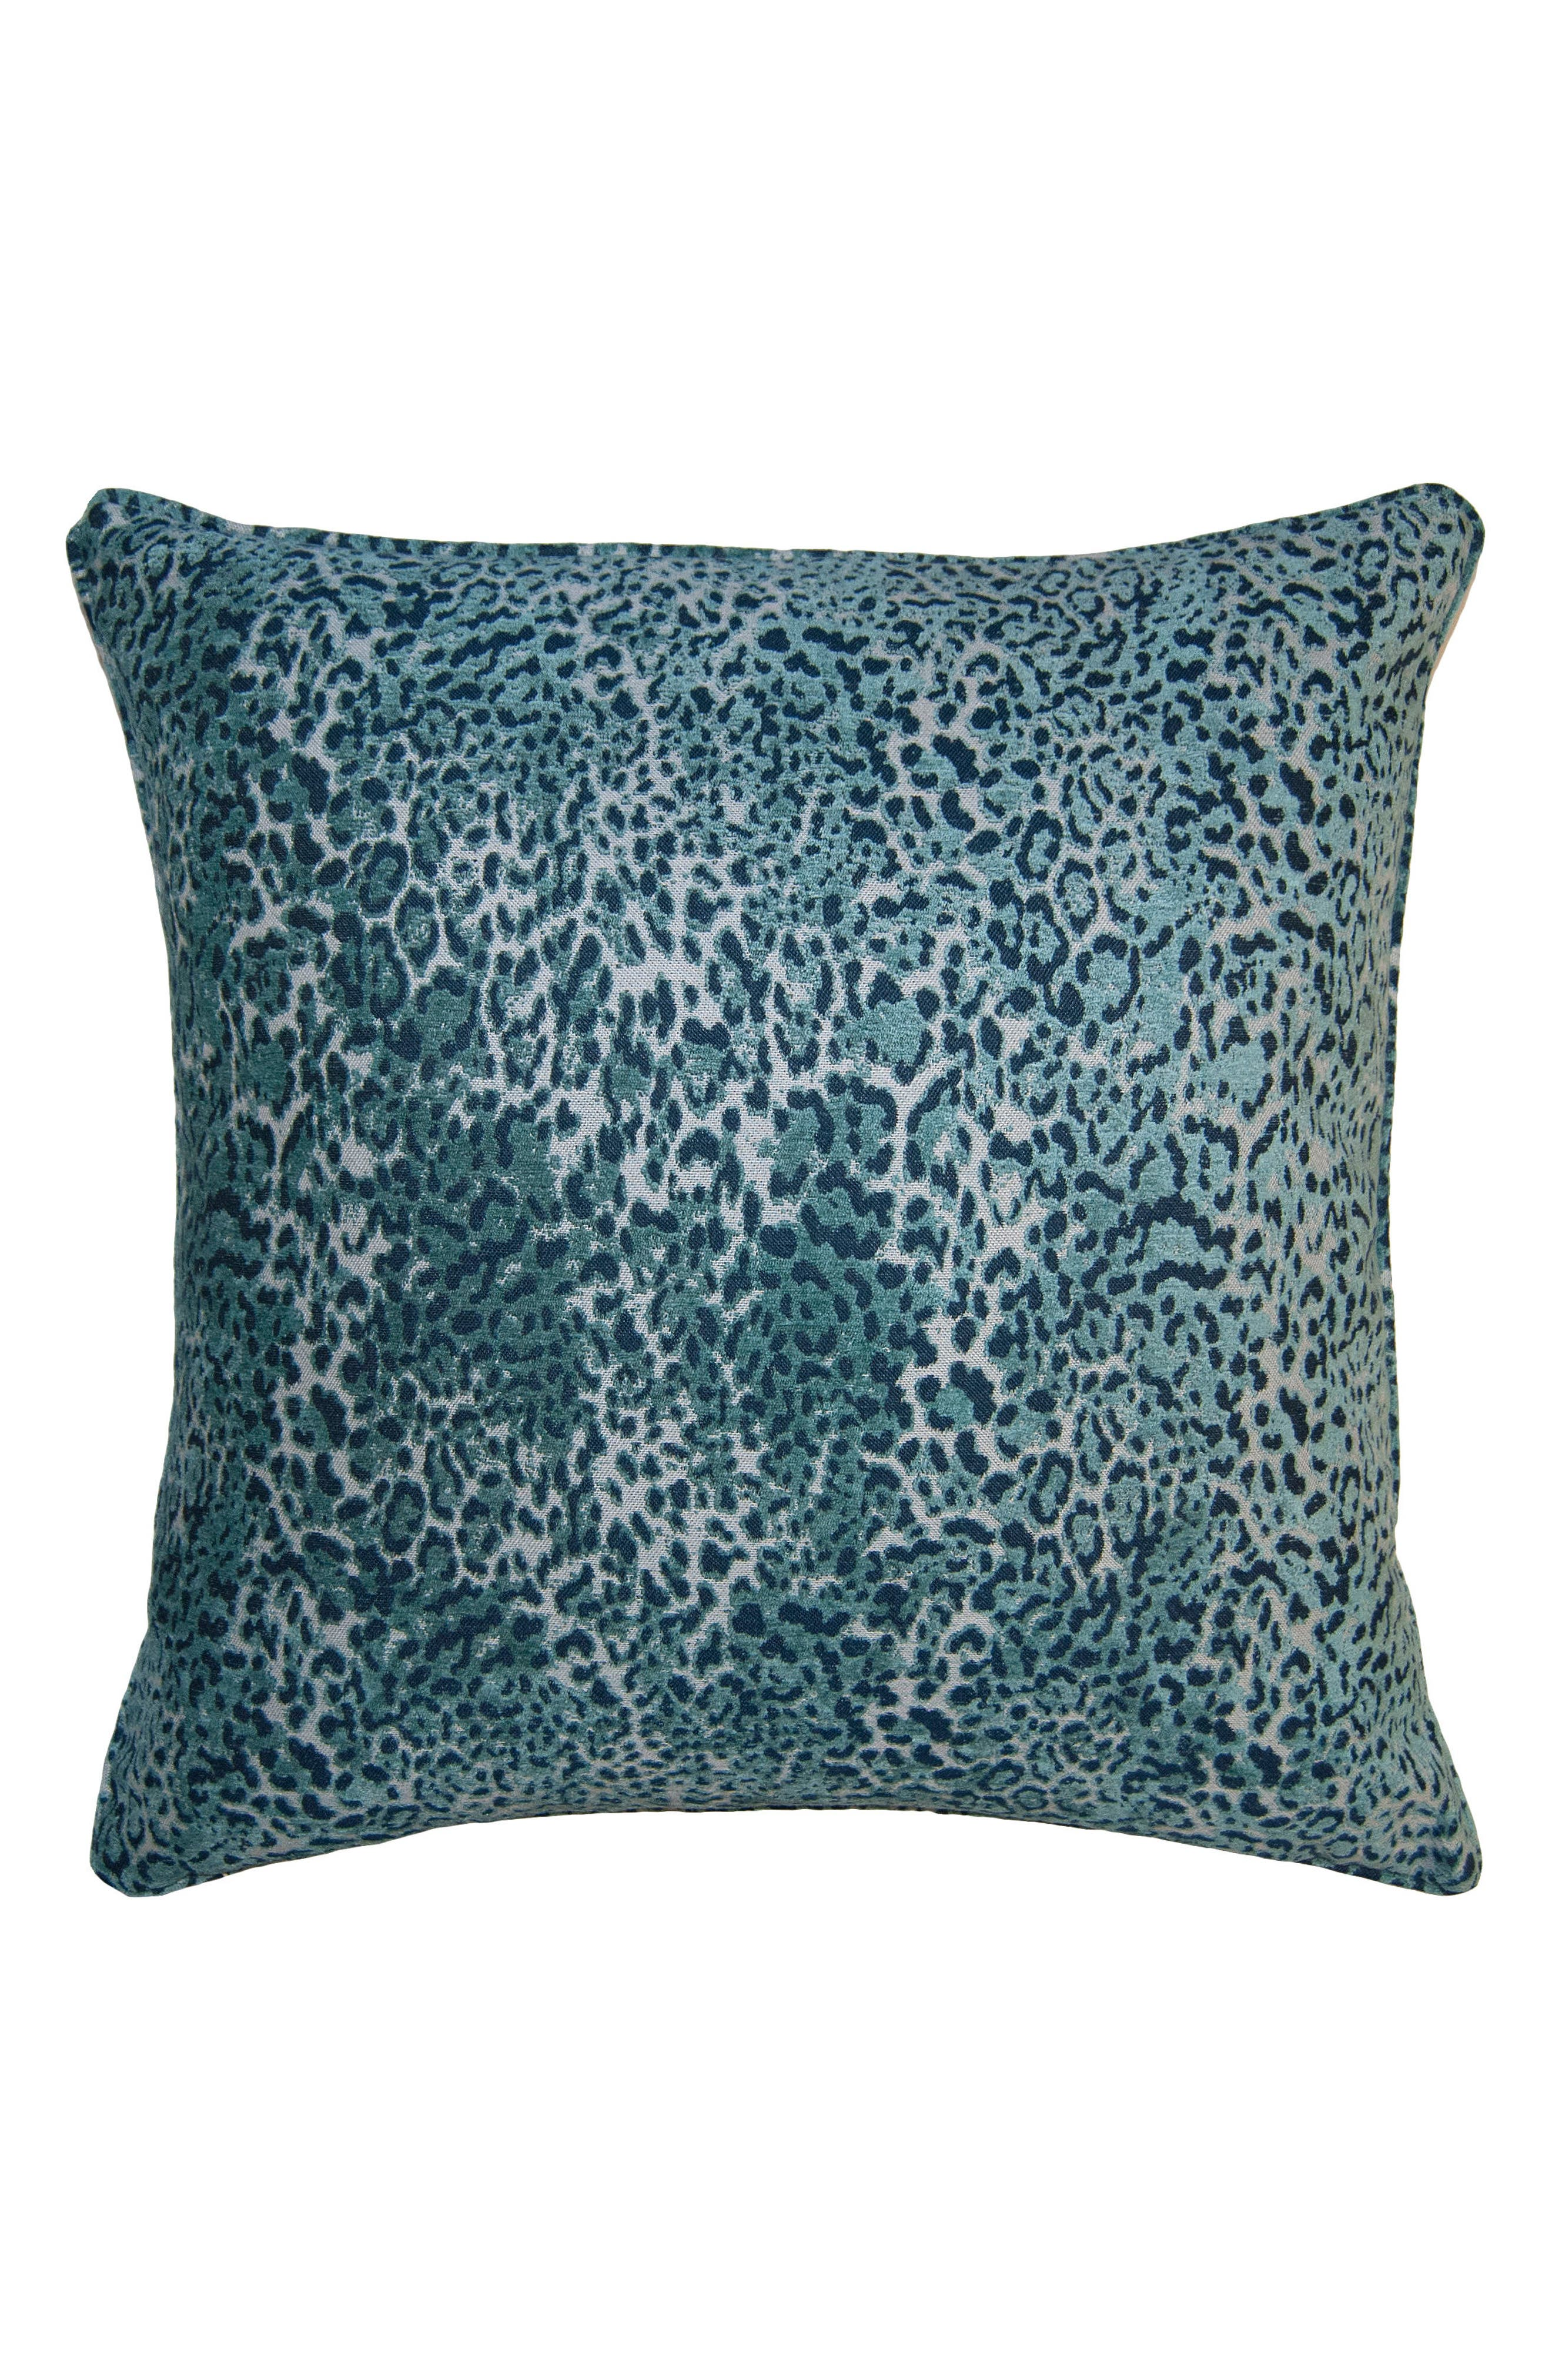 Square Feathers Sky Safari Accent Pillow